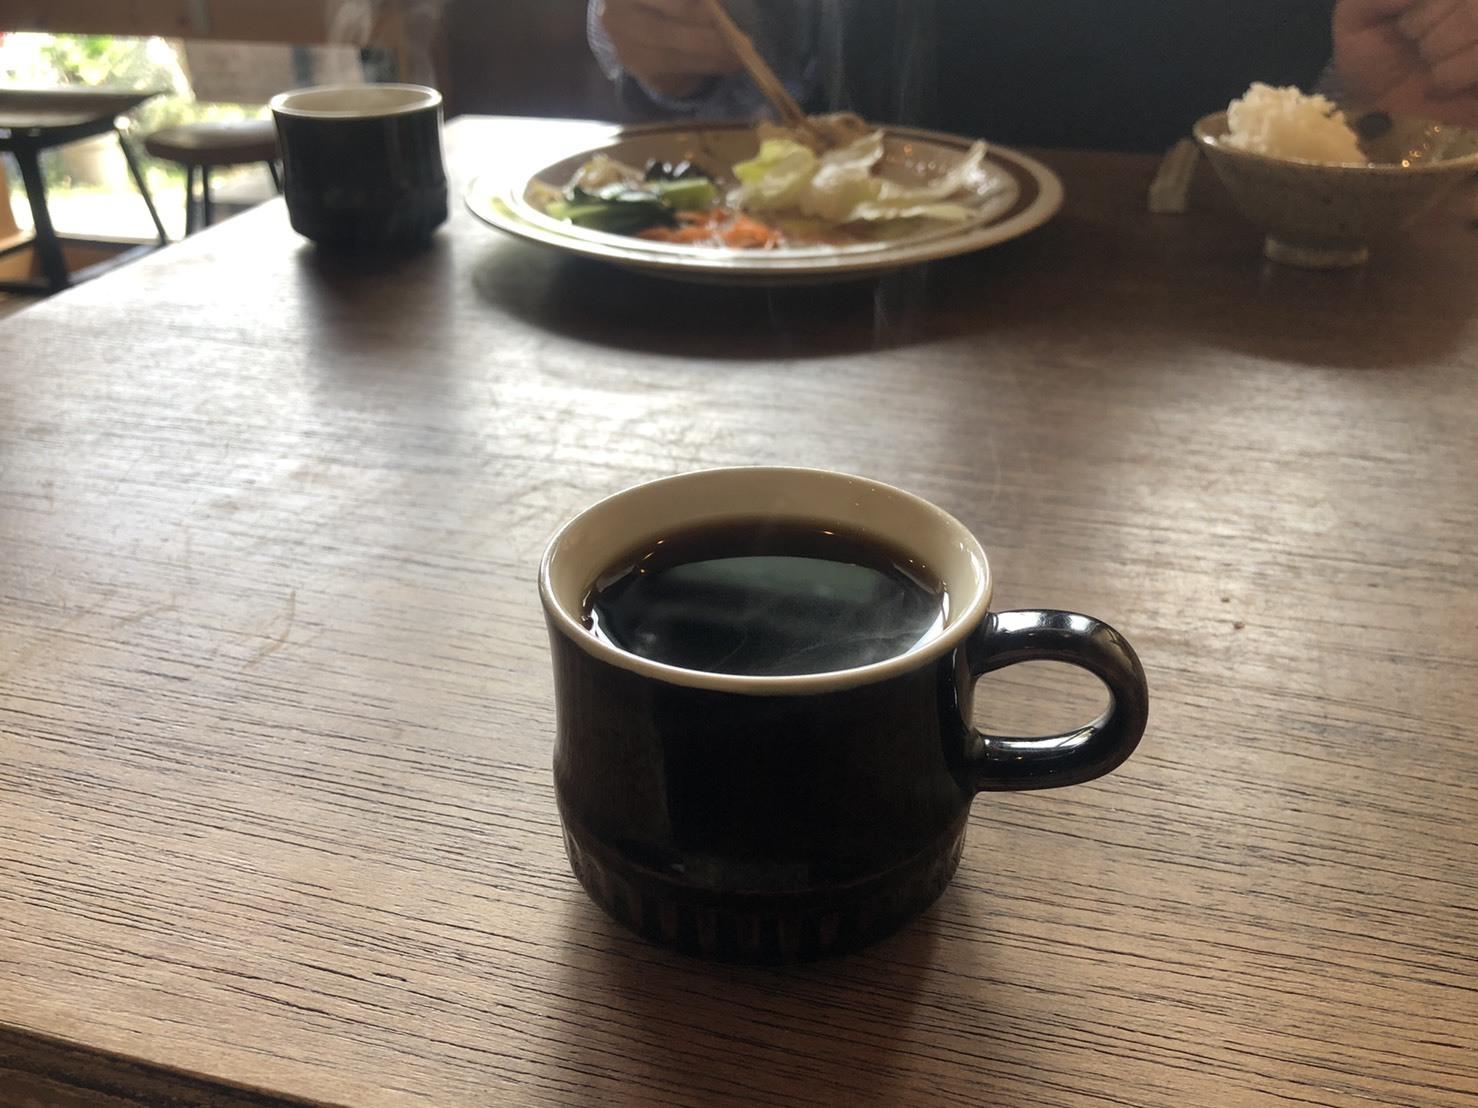 cafe Barrackに行ってきました!_f0220354_17585948.jpeg